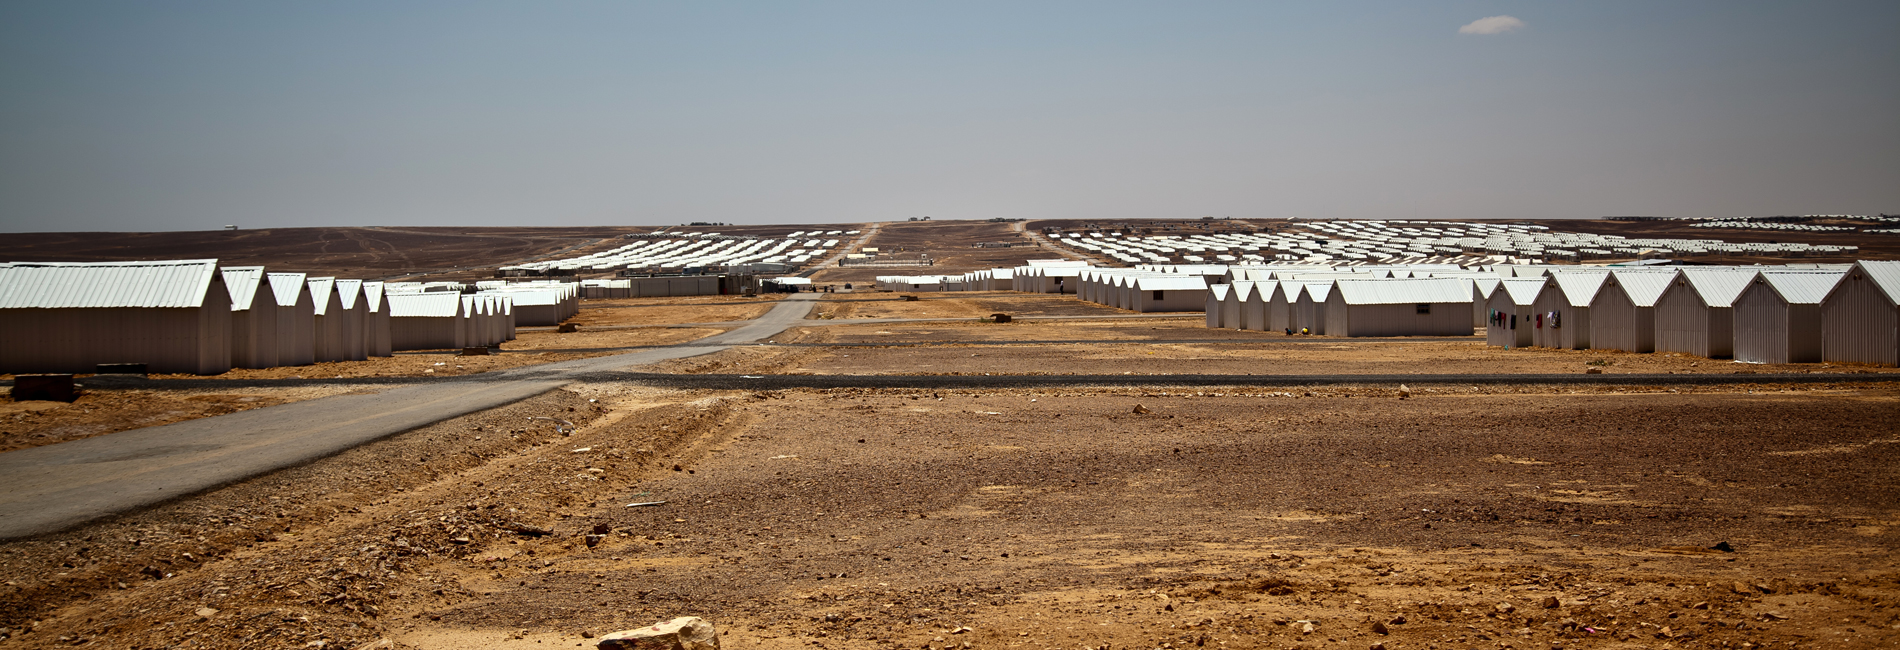 Foto: BLick auf die Hütten des Flüchtlingslagers Azraq in Jordanien.